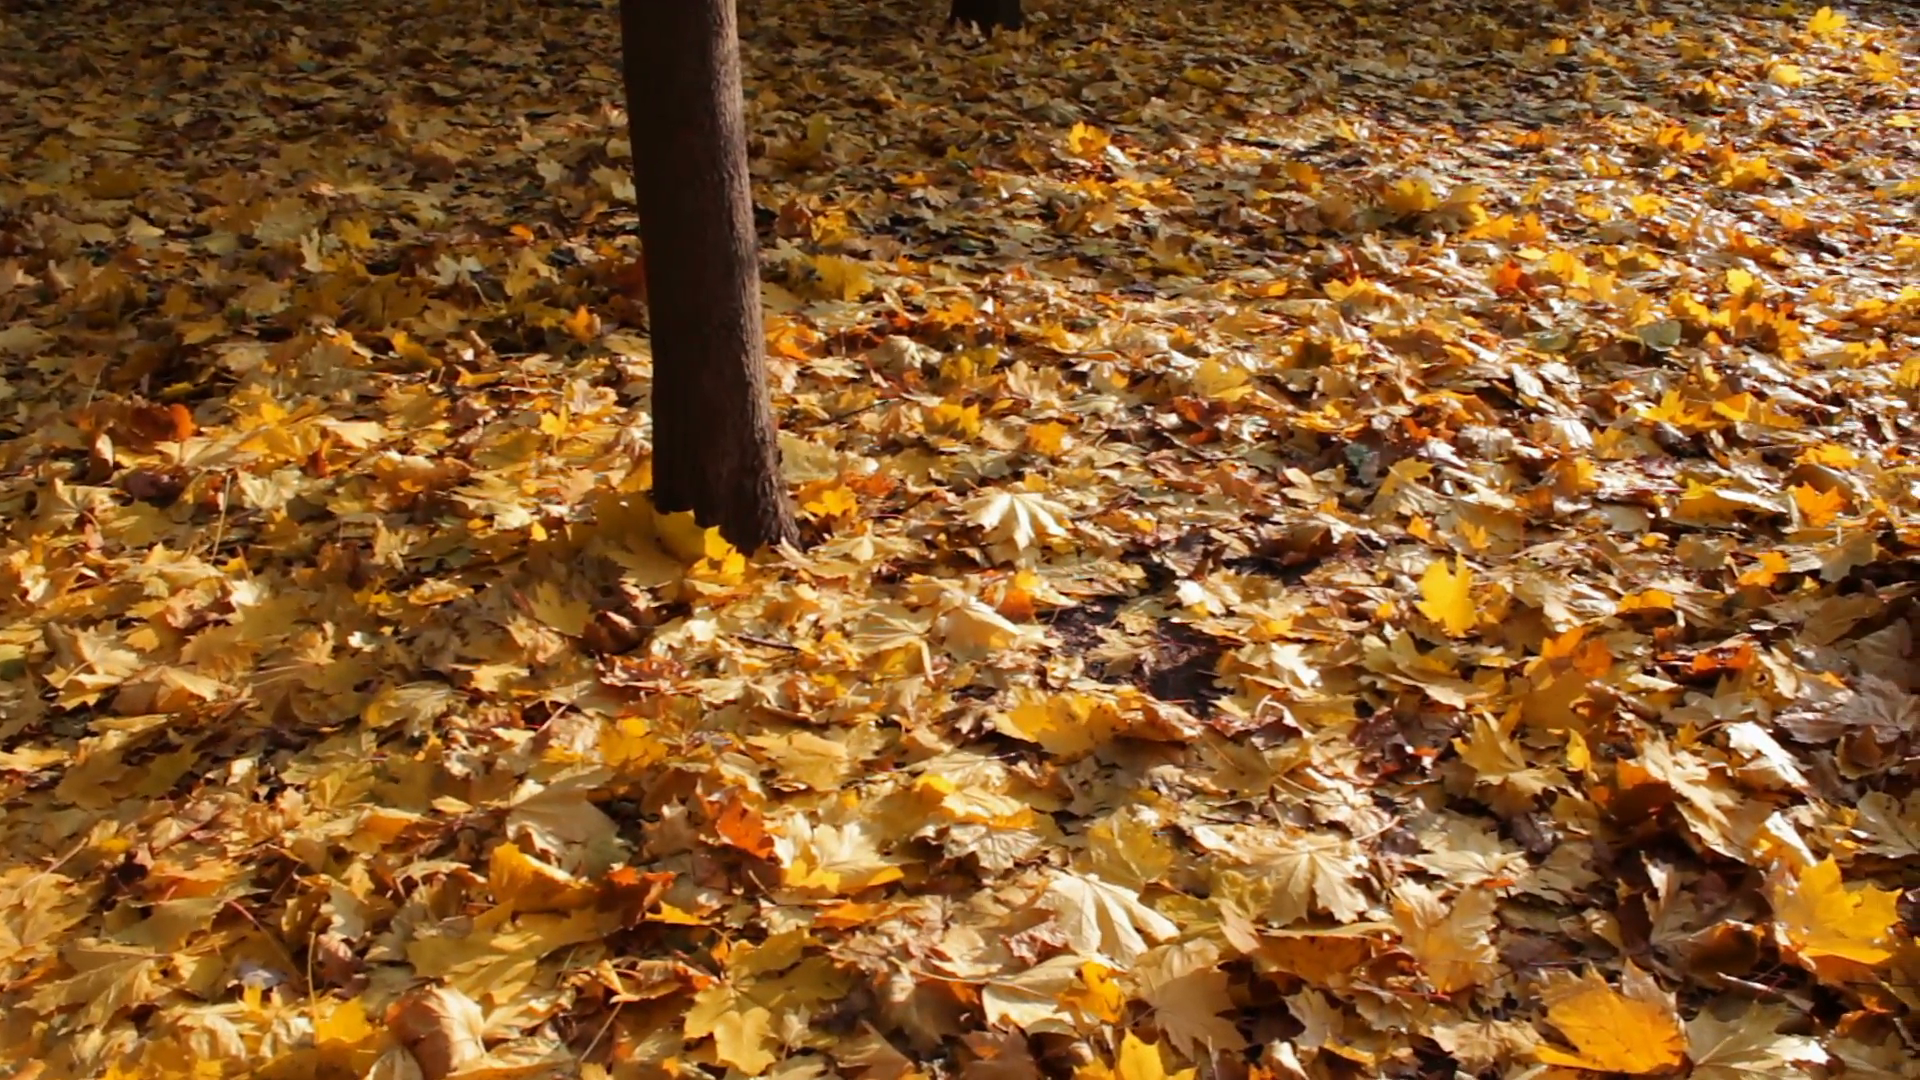 Yellow fallen leaves in autumn forest Stock Video Footage - Videoblocks